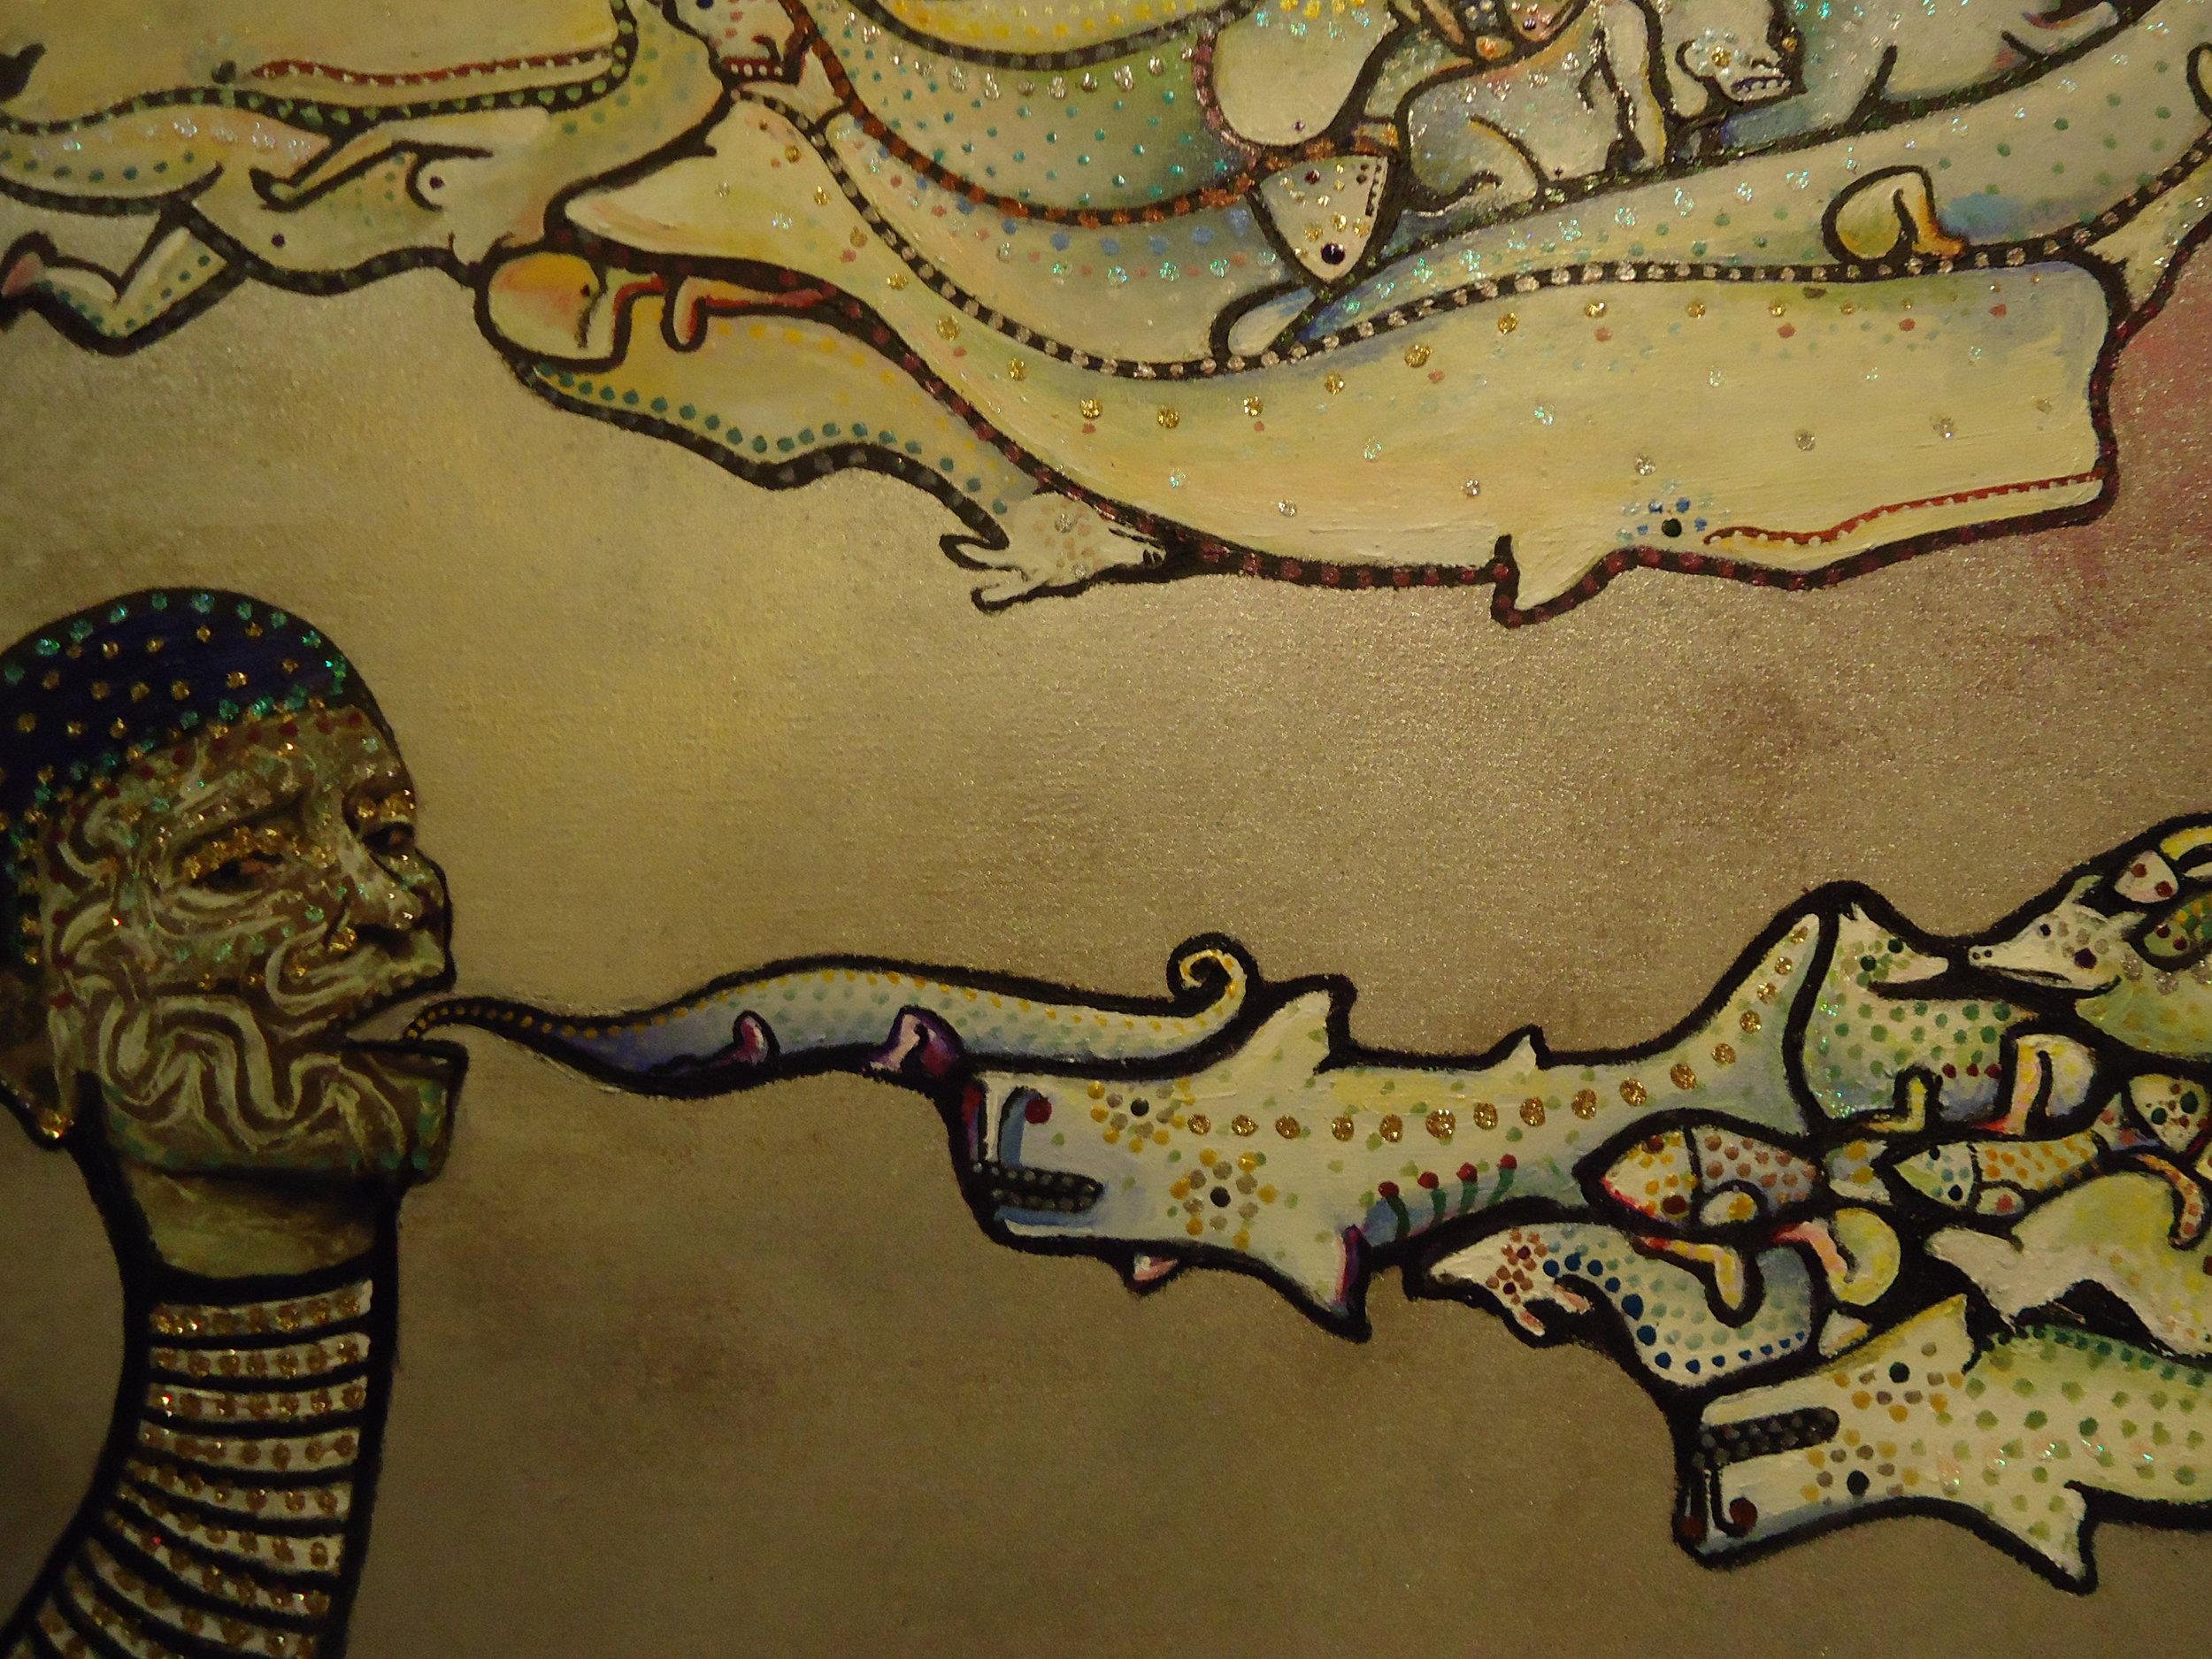 artist-jason-borders-paintings-art.jpg